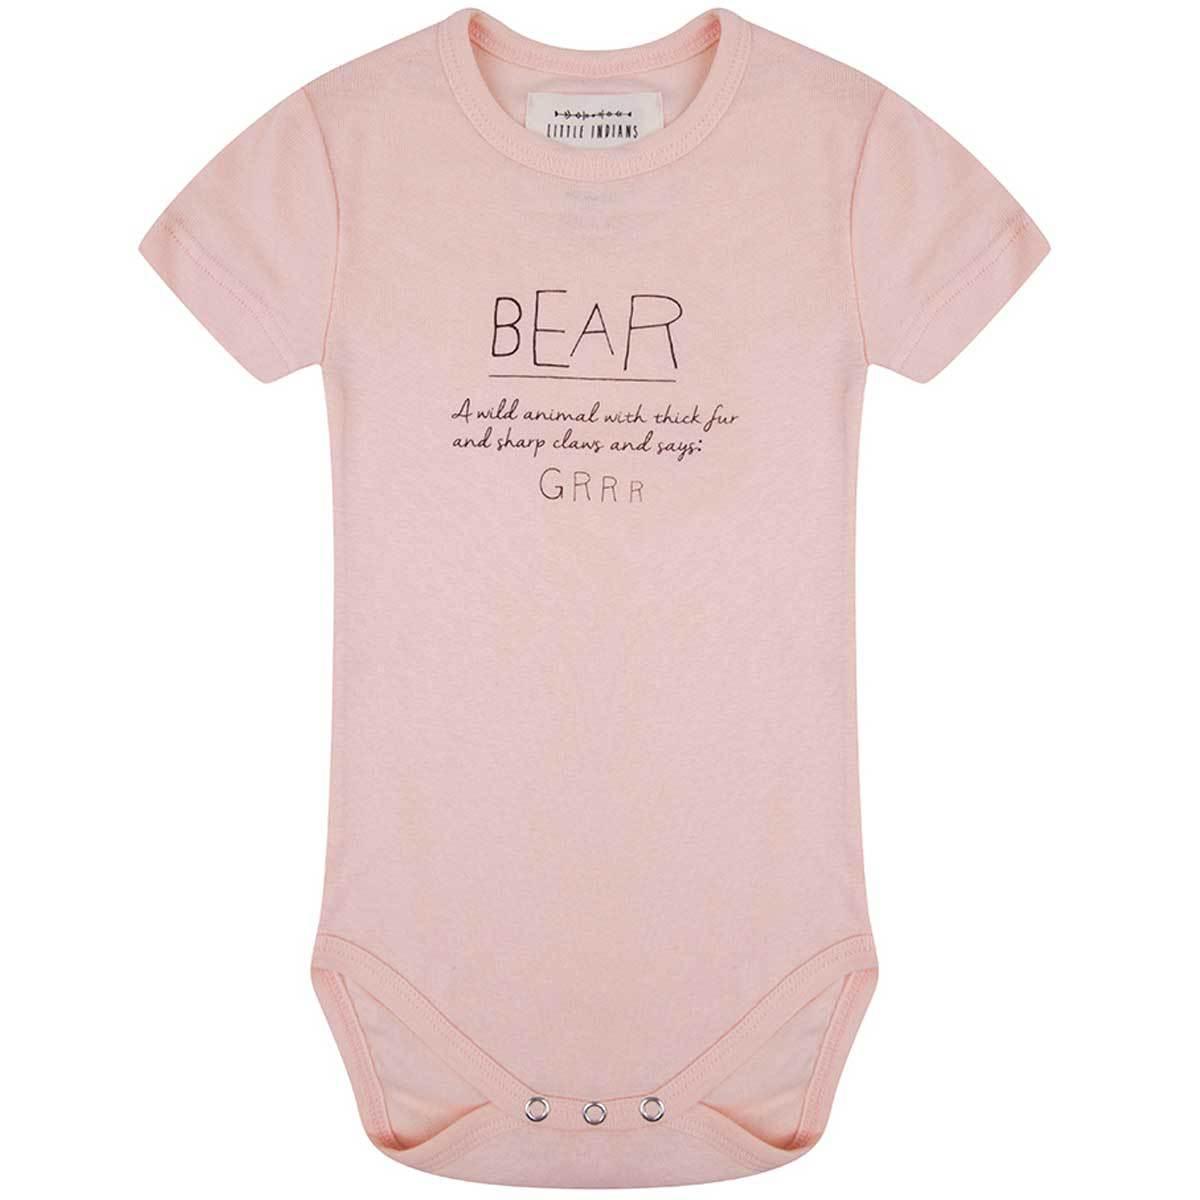 Body et Pyjama Body Bear - Shallop Shell - 18/24 mois Body Bear - Shallop Shell - 18/24 mois